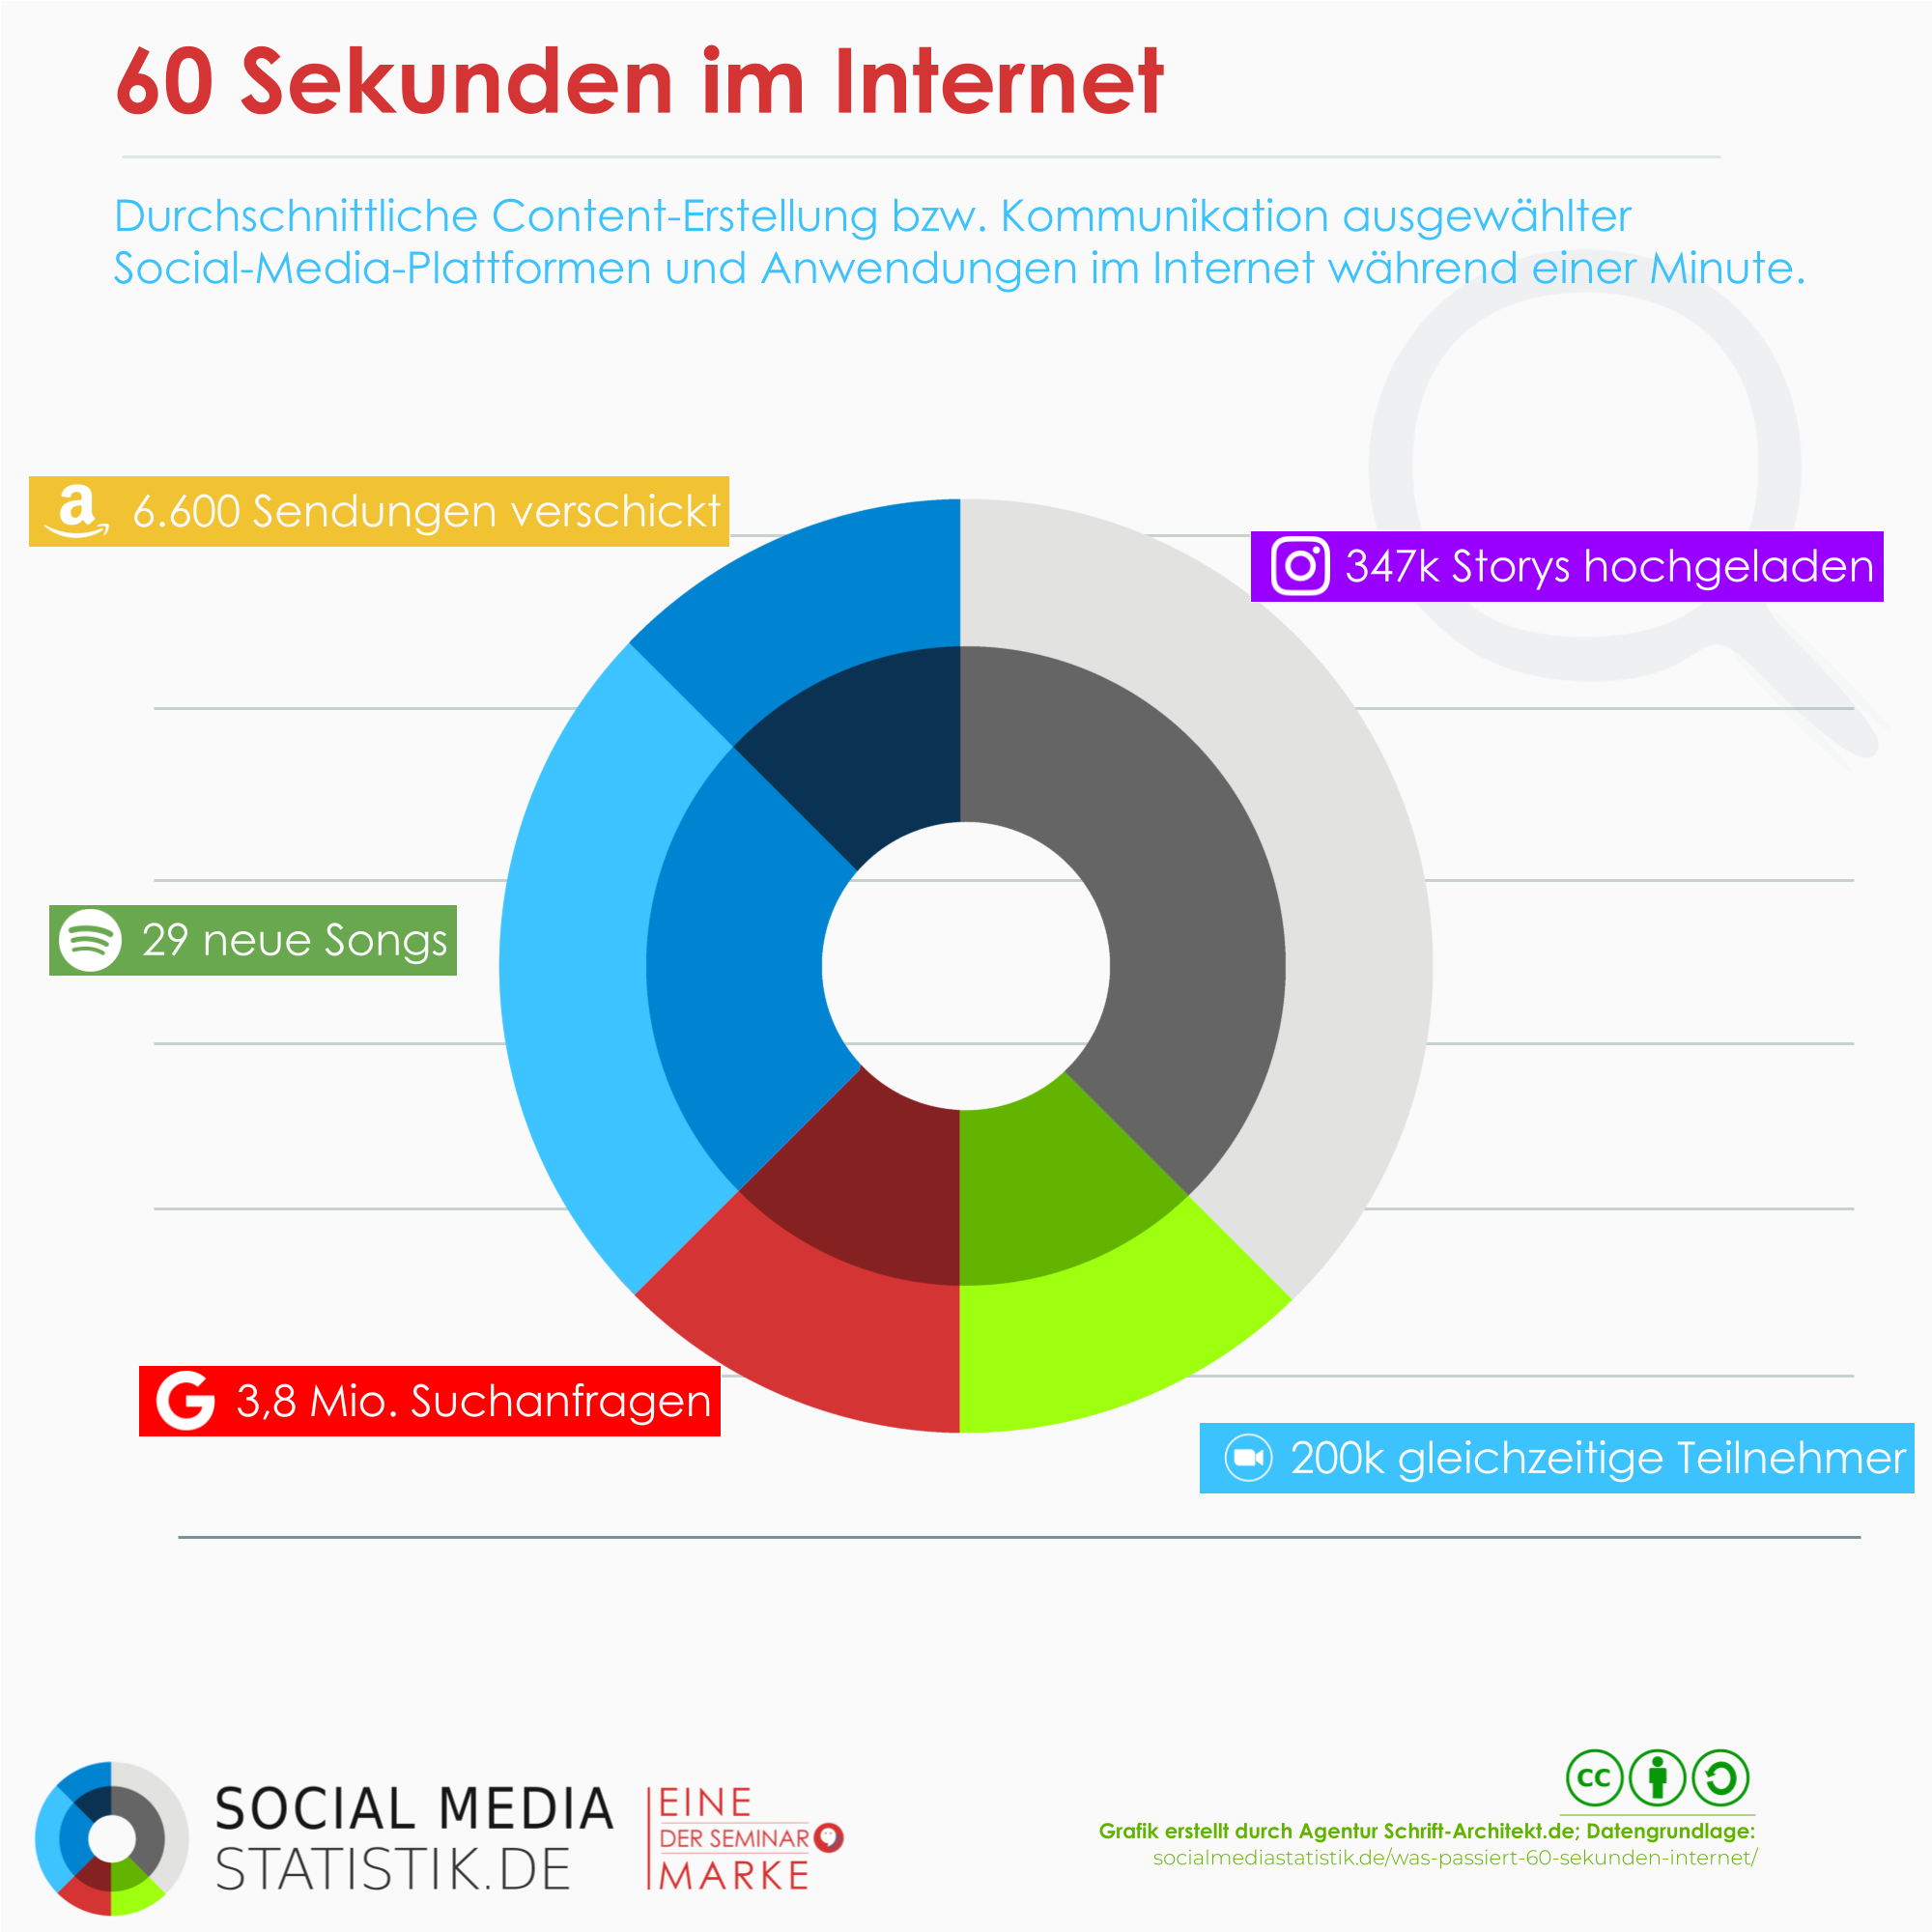 Infografik Social Media Statistik 60 Sekunden im Internet 2021